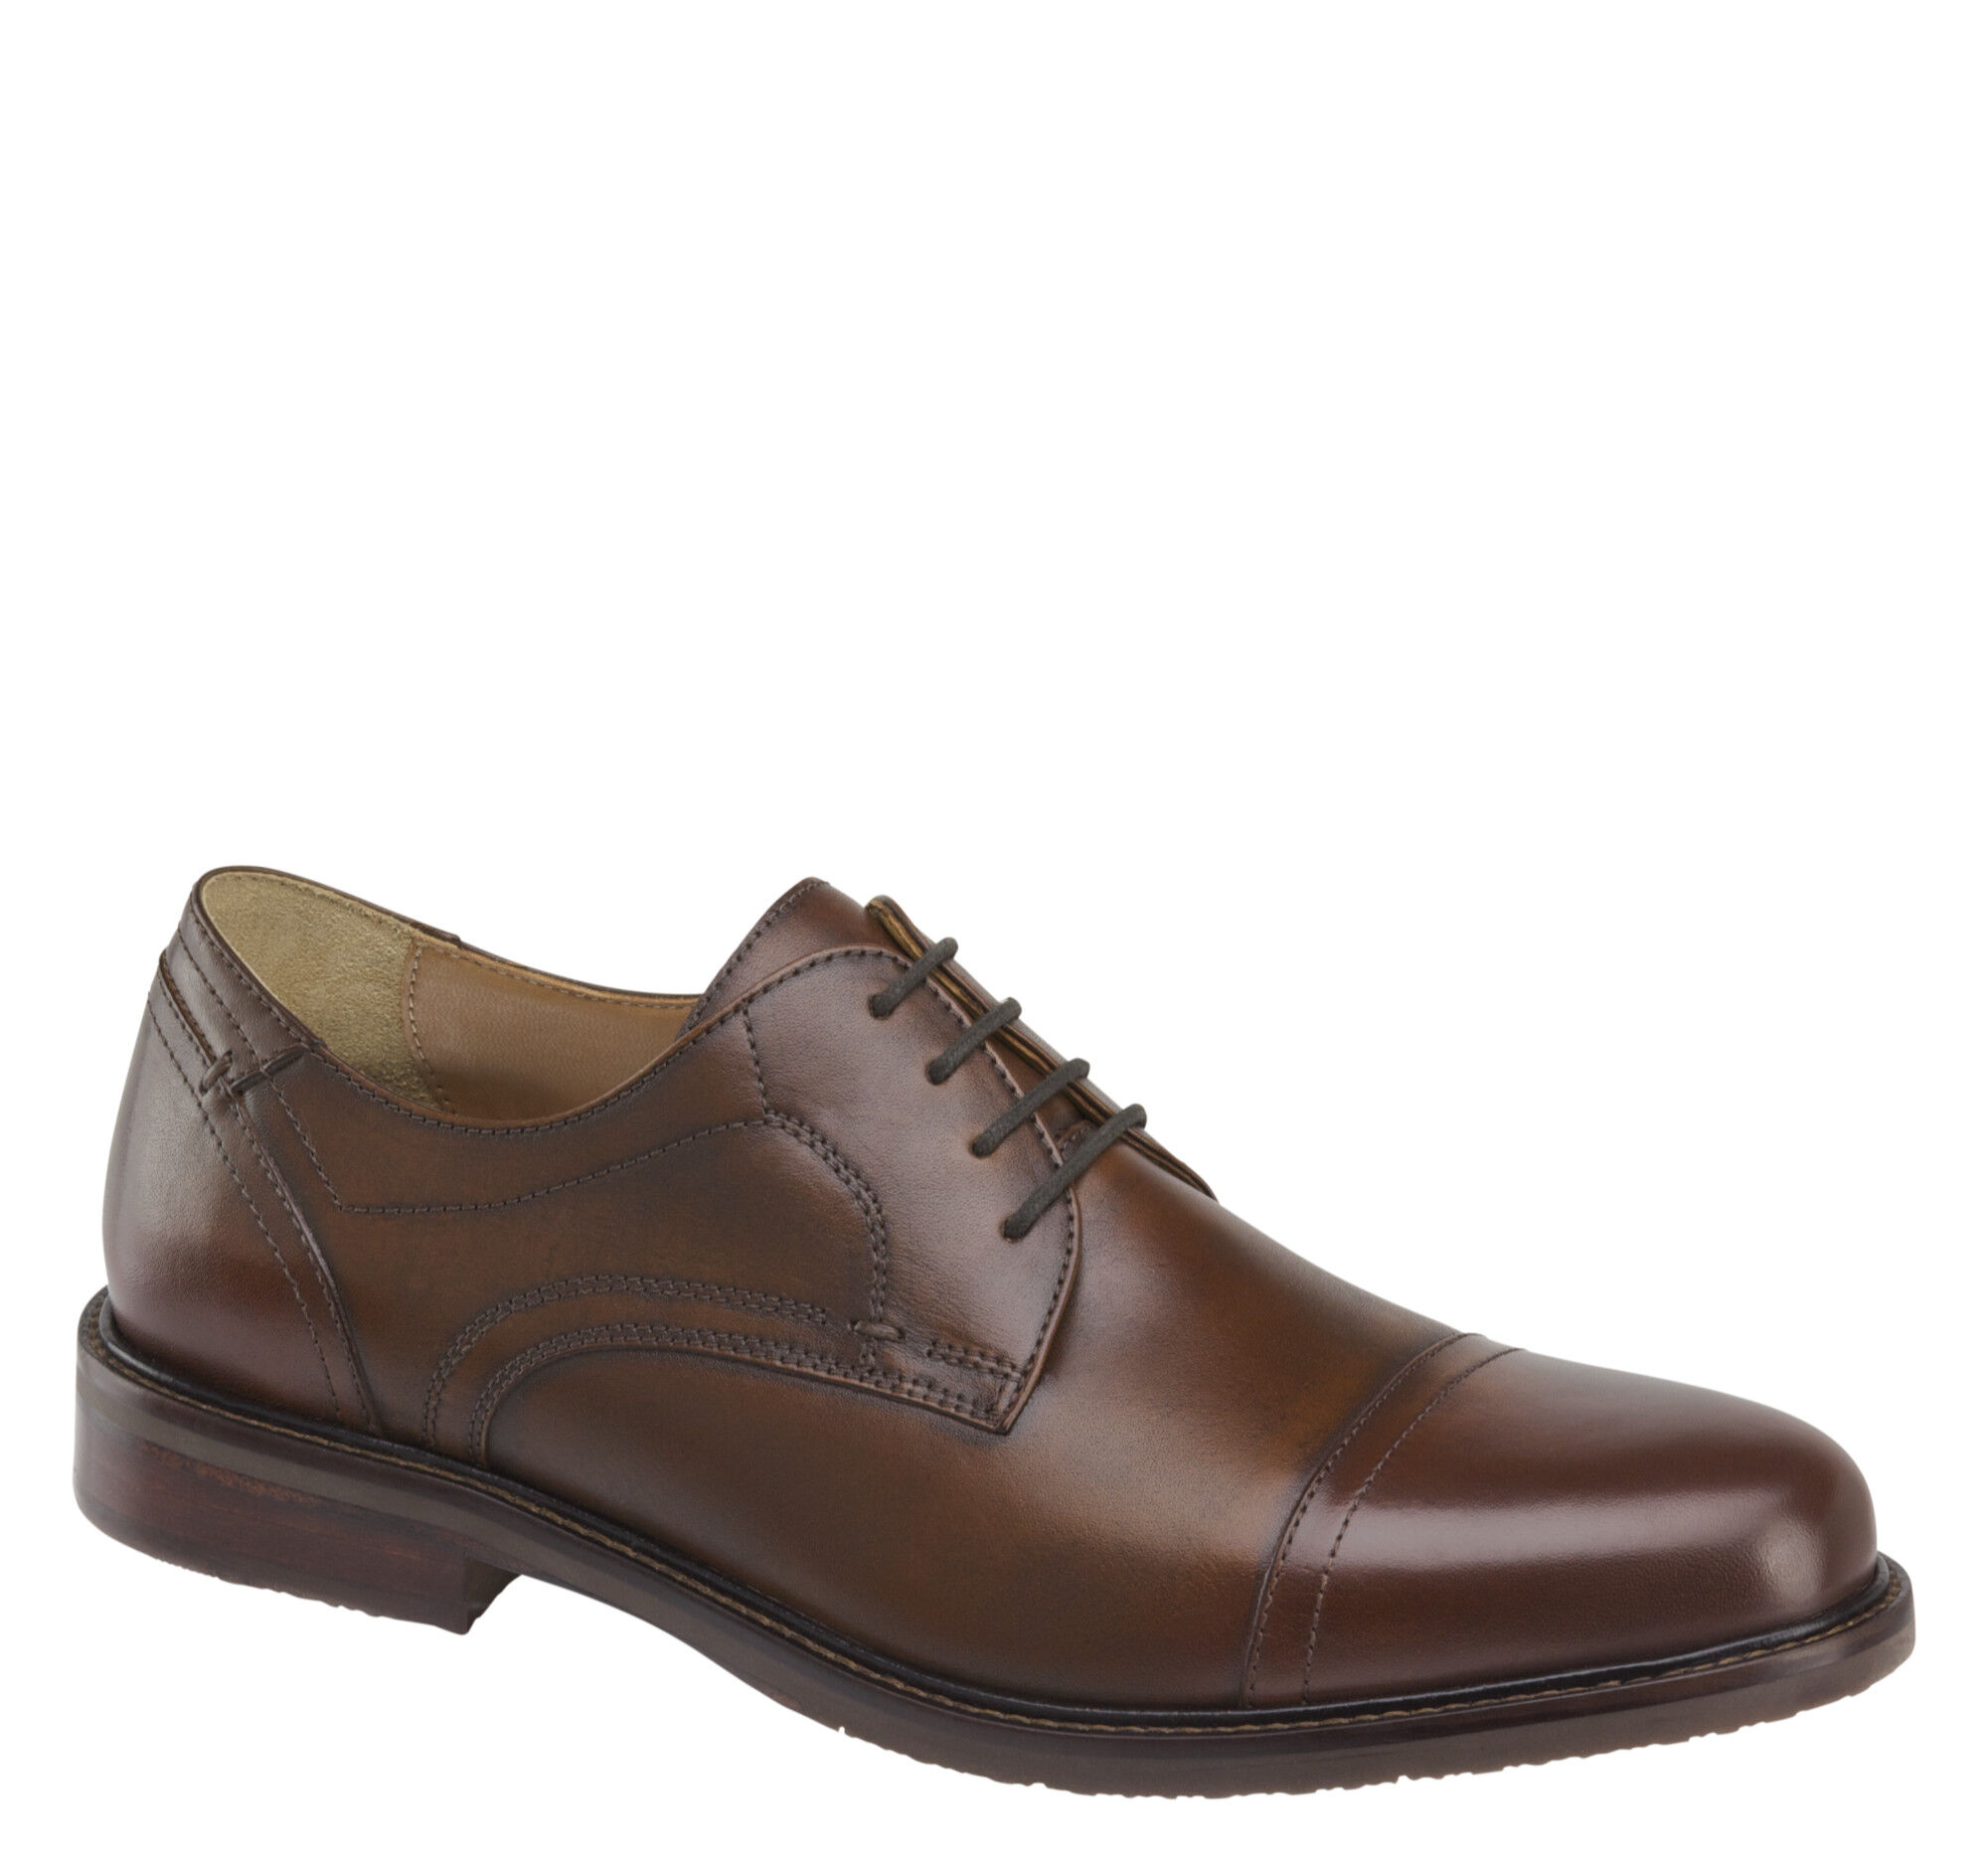 Johnston & Murphy Men's Ramsey Cap-Toe Oxfords Men's Shoes